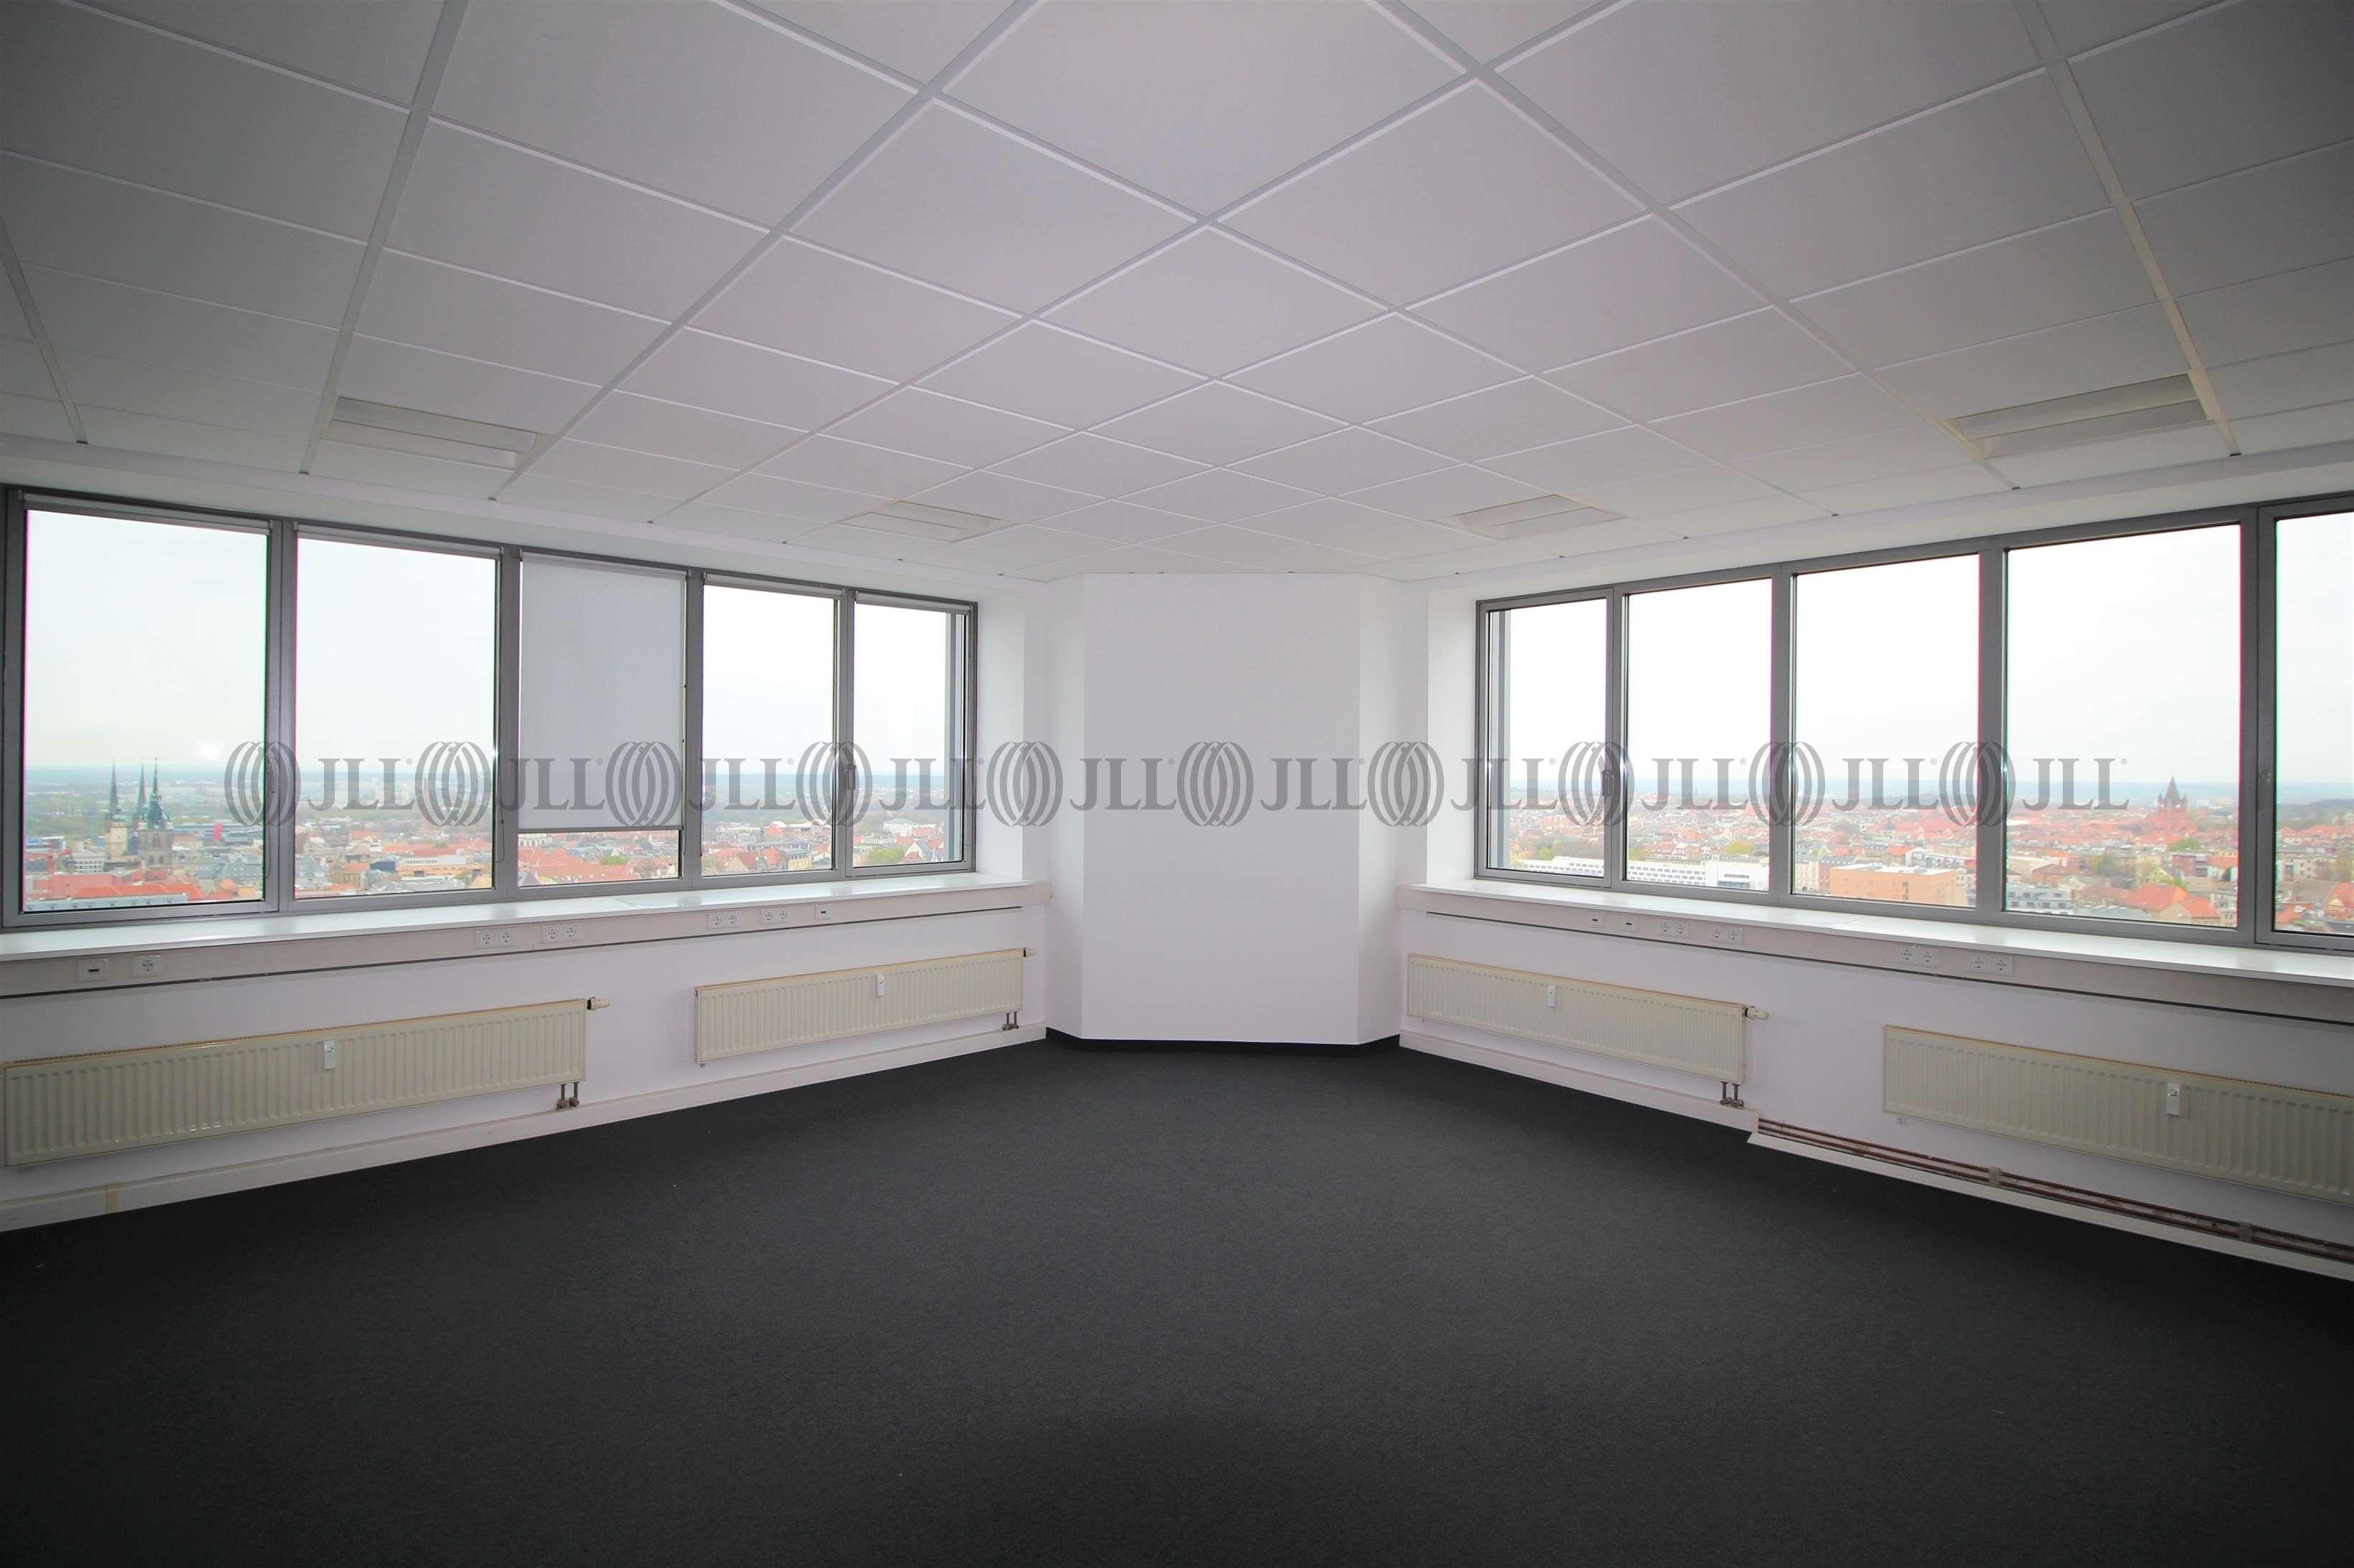 Büros Halle (saale), 06112 - Büro - Halle (Saale), Innenstadt - B1699 - 10080733